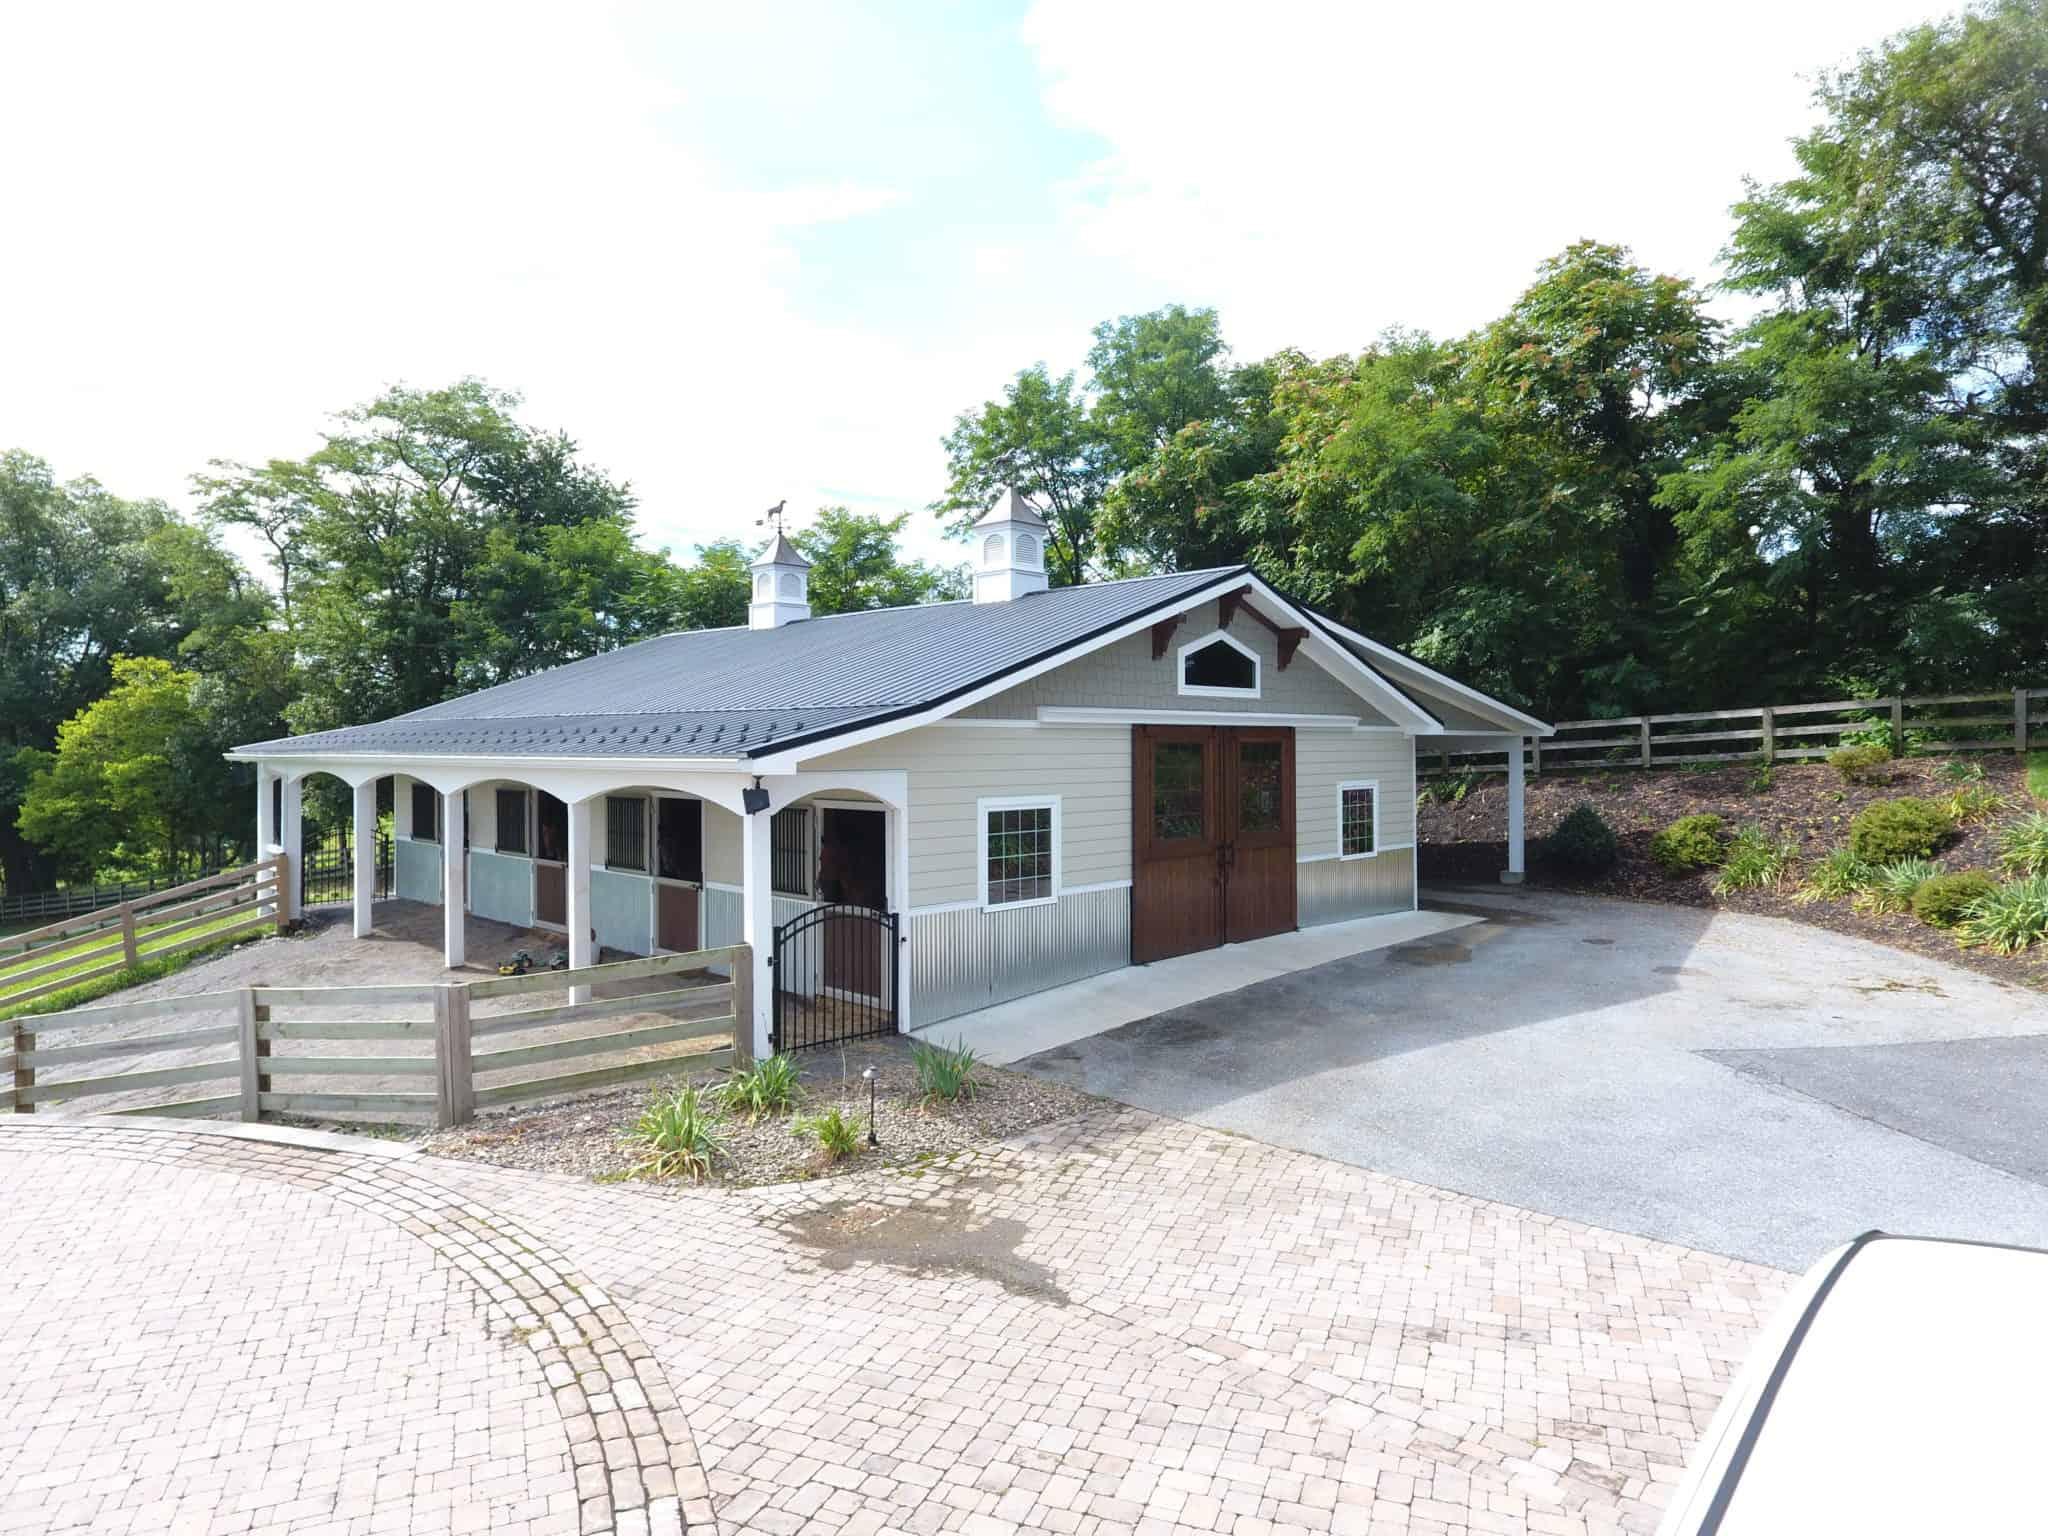 horse stalls barn doors cupola